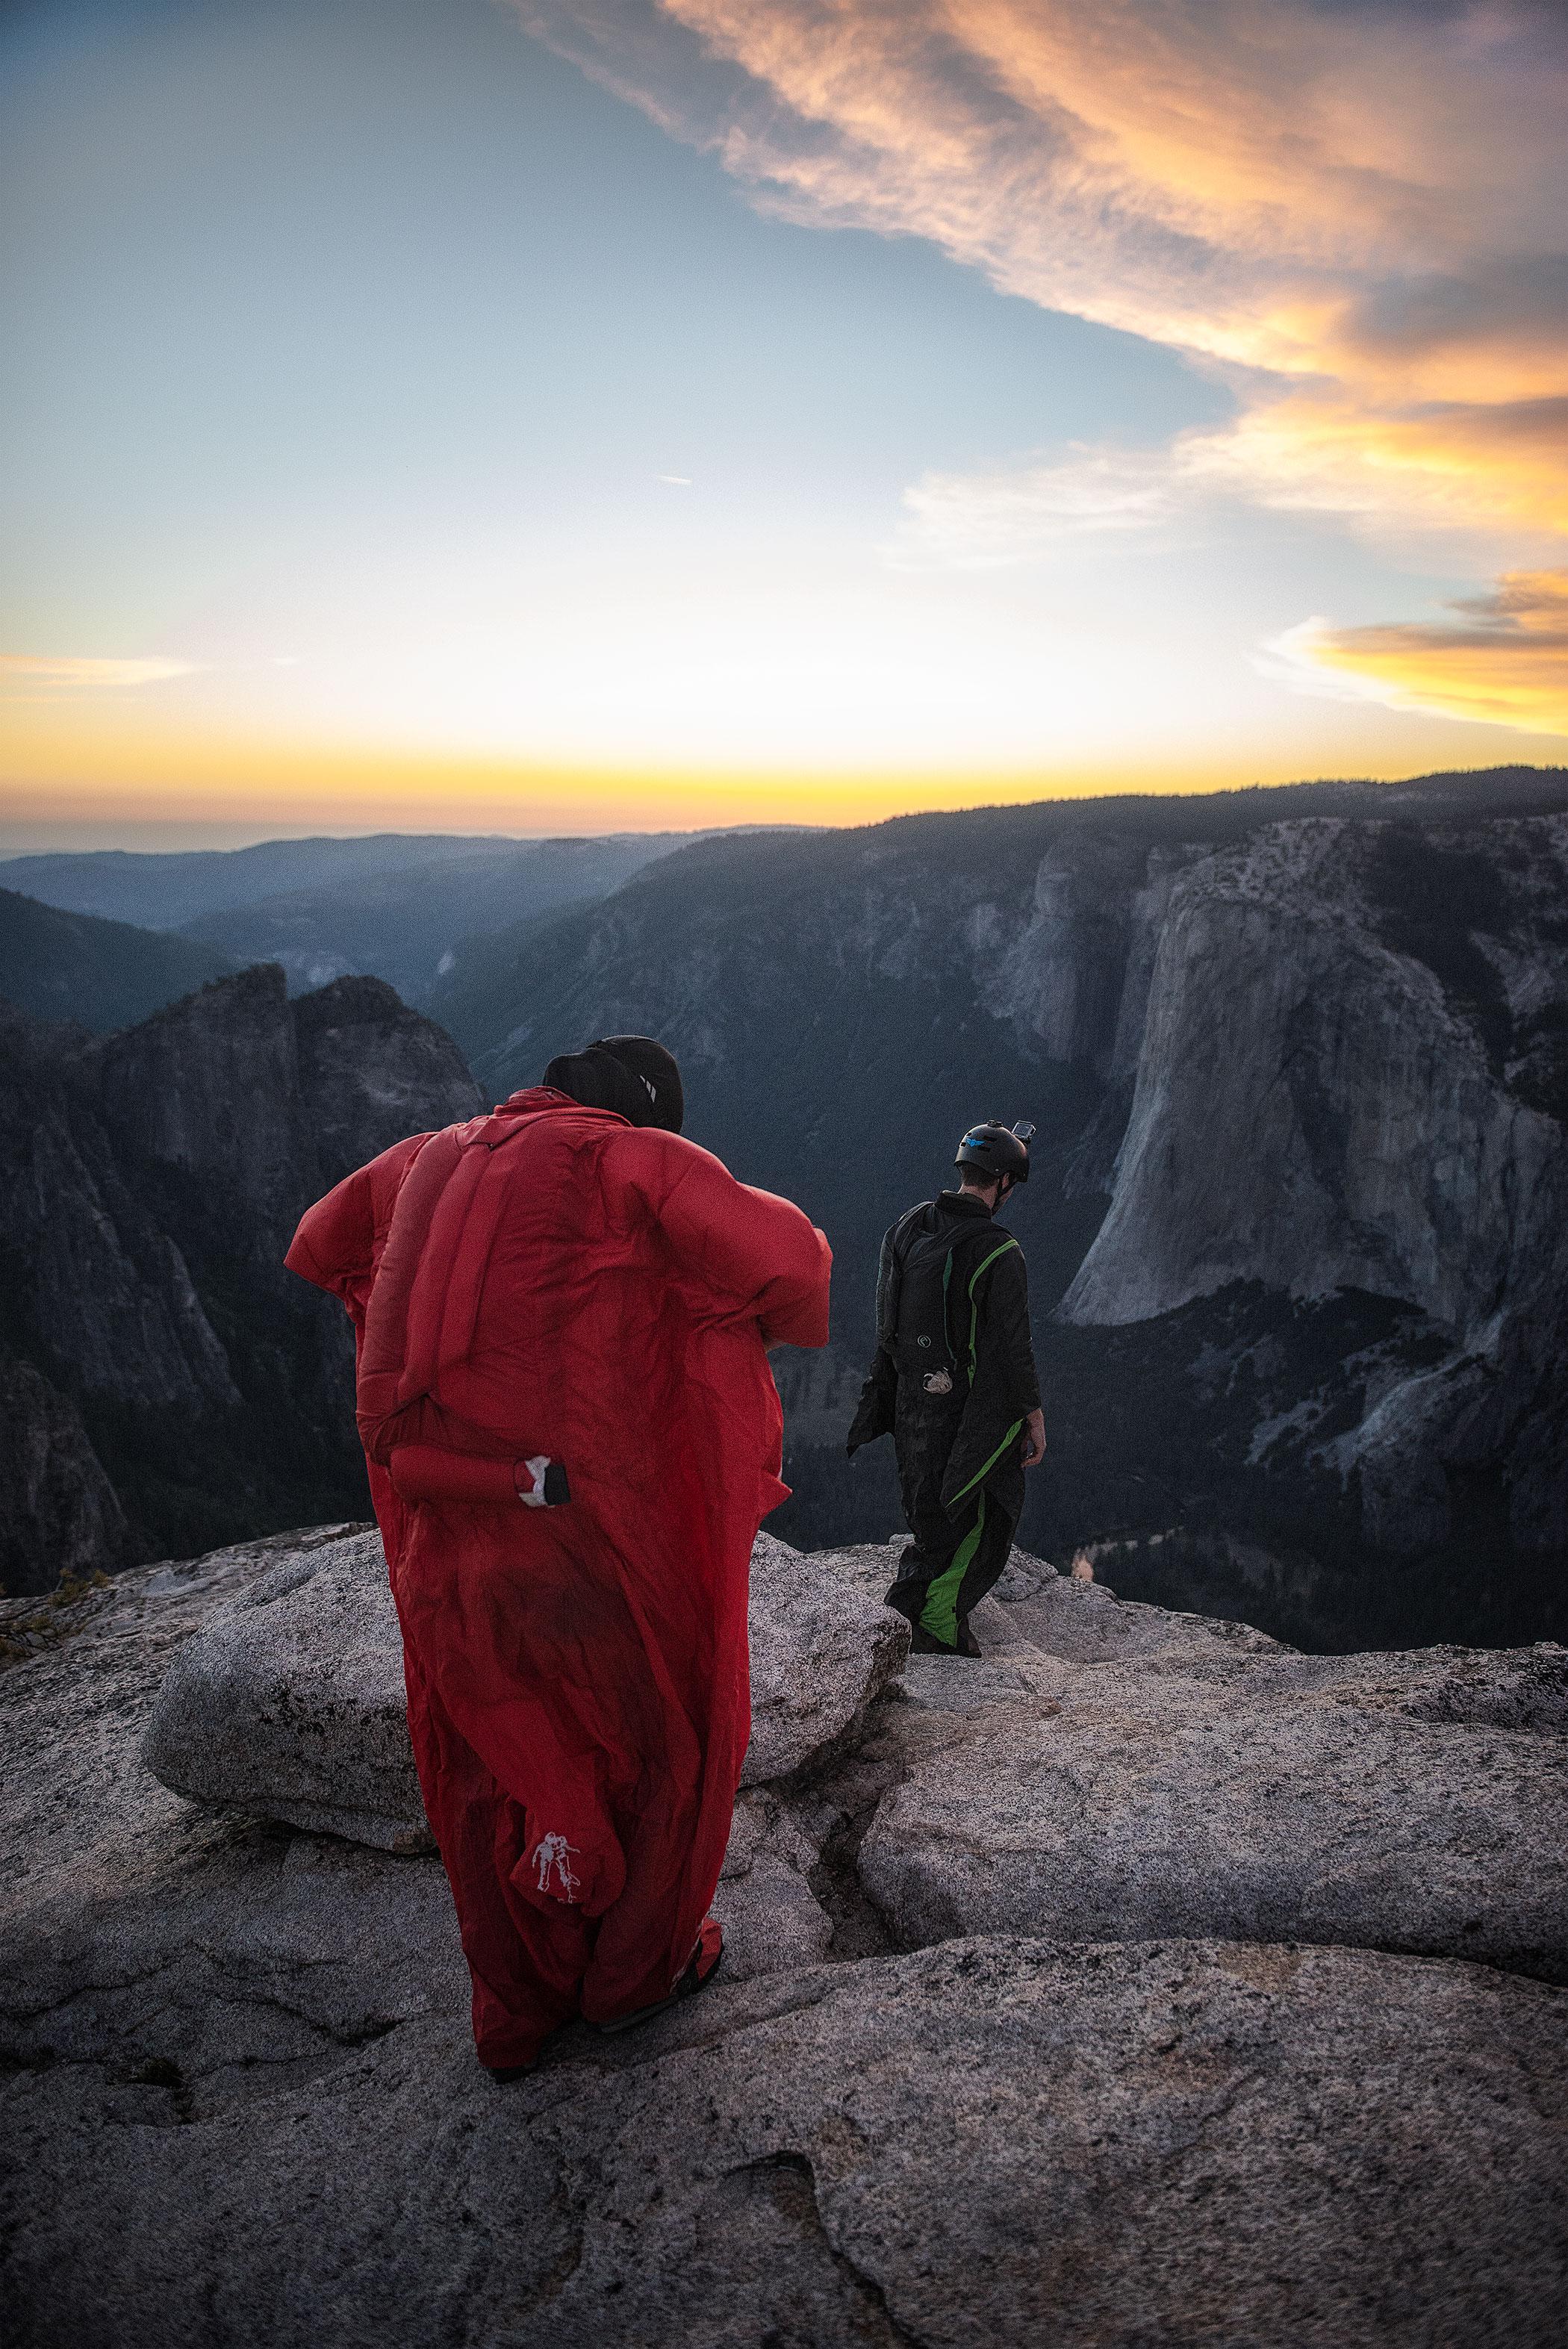 austin-trigg-wing-suit-base-jump-fly-taft-point-yosemite-lifestyle-california-adventure-thrill-seeking-dean-potter-prep-wingsuit.jpg